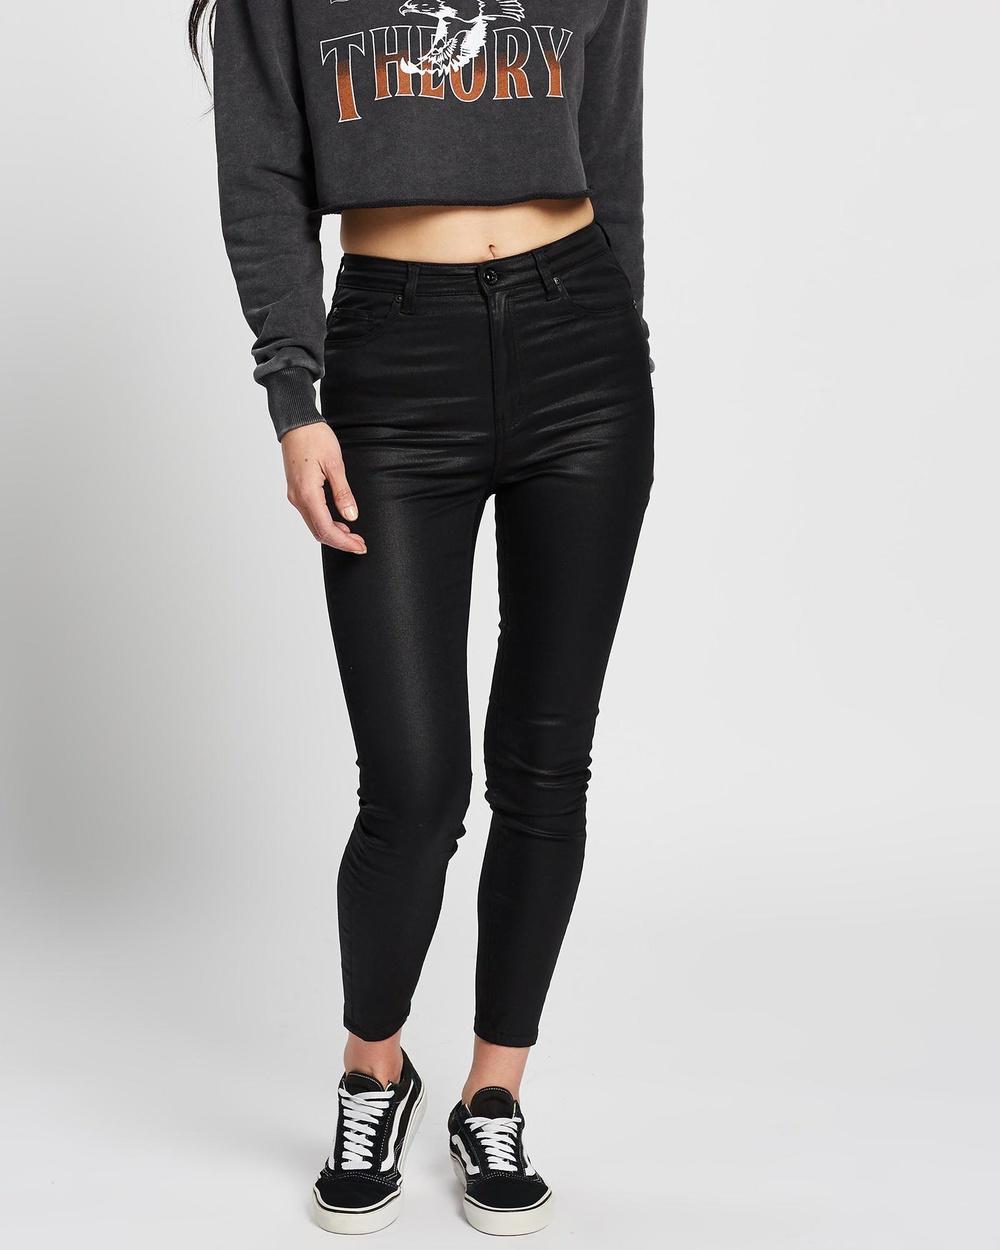 Silent Theory The Vice High Skinny Jeans High-Waisted BLACK High-Waisted Australia